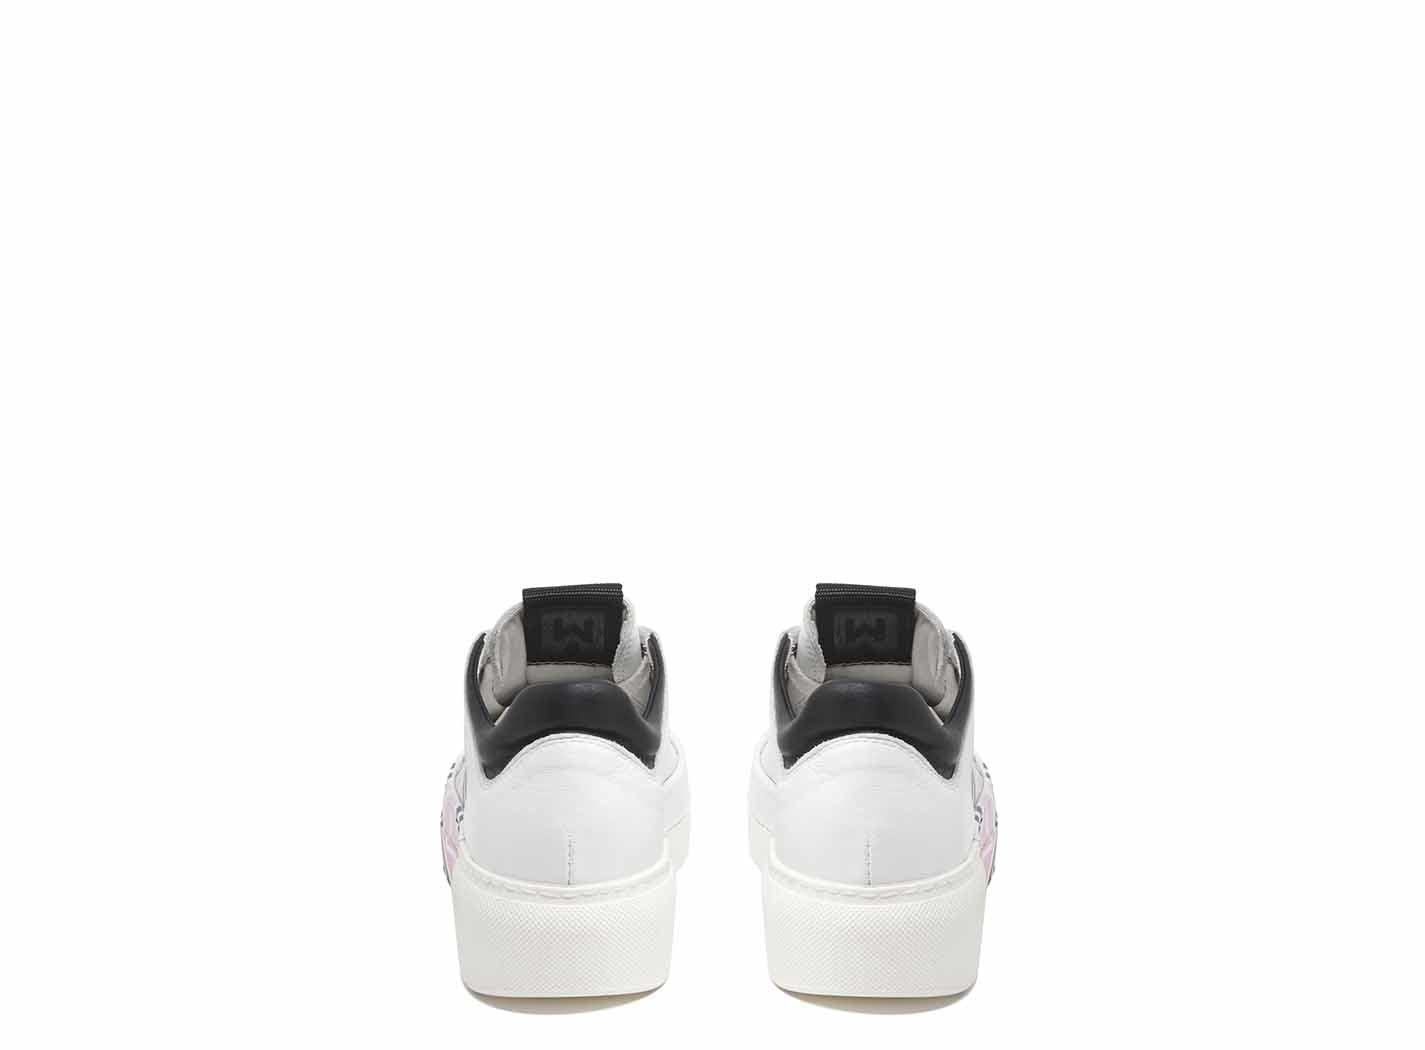 Sneakers allacciata Vic Matiè.